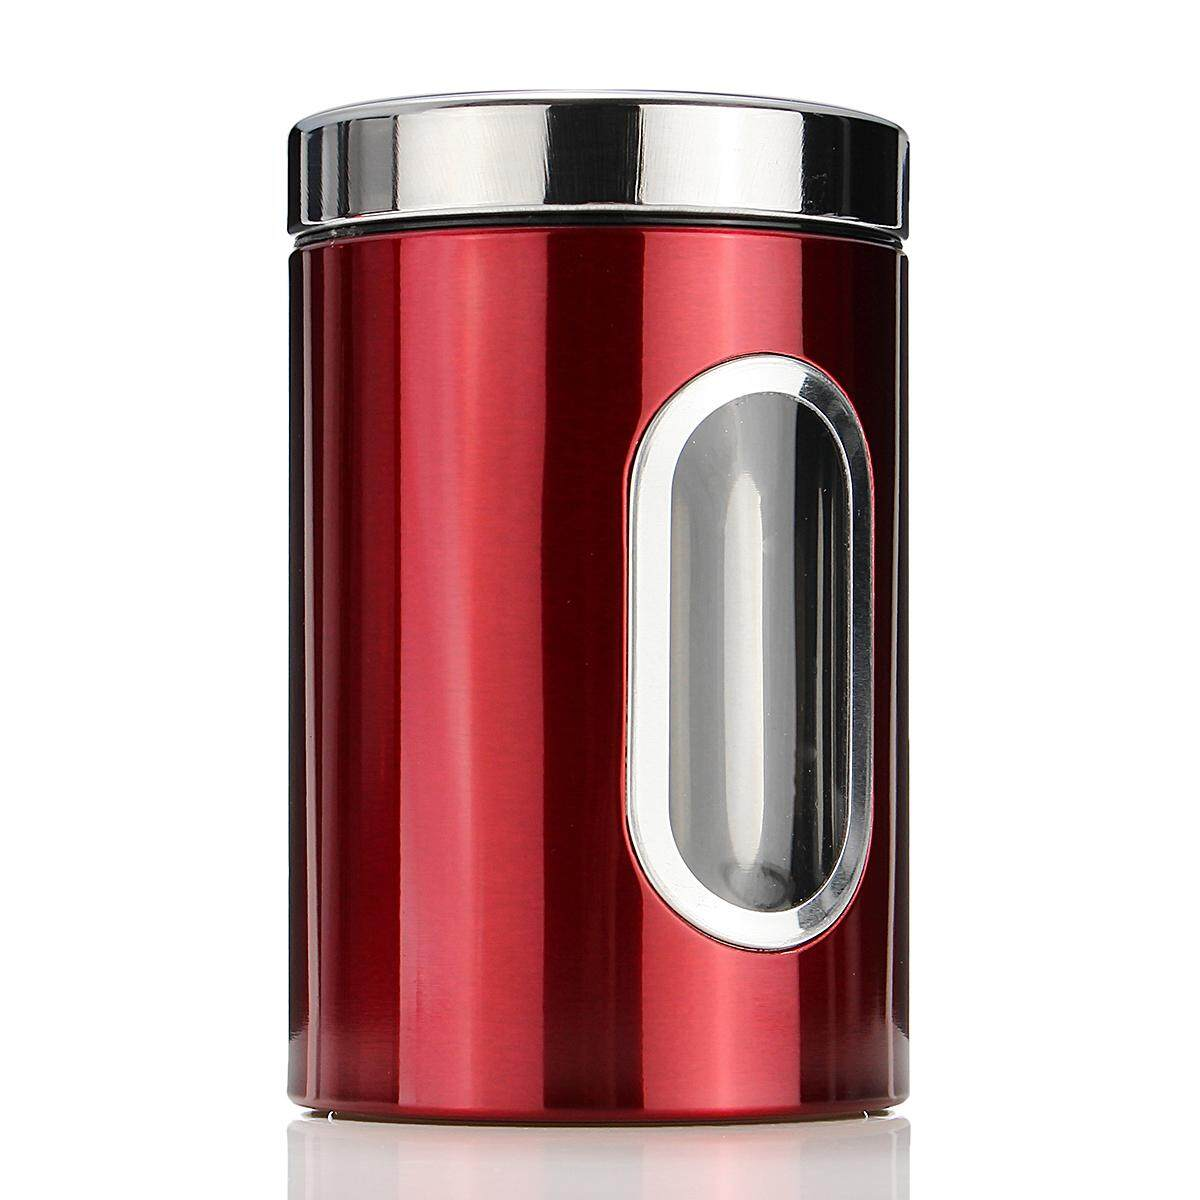 ... 3 Pcs Jendela Baja Anti Karat Tabung Teh Kopi Gula Toples Kacang Penyimpanan Set-Intl